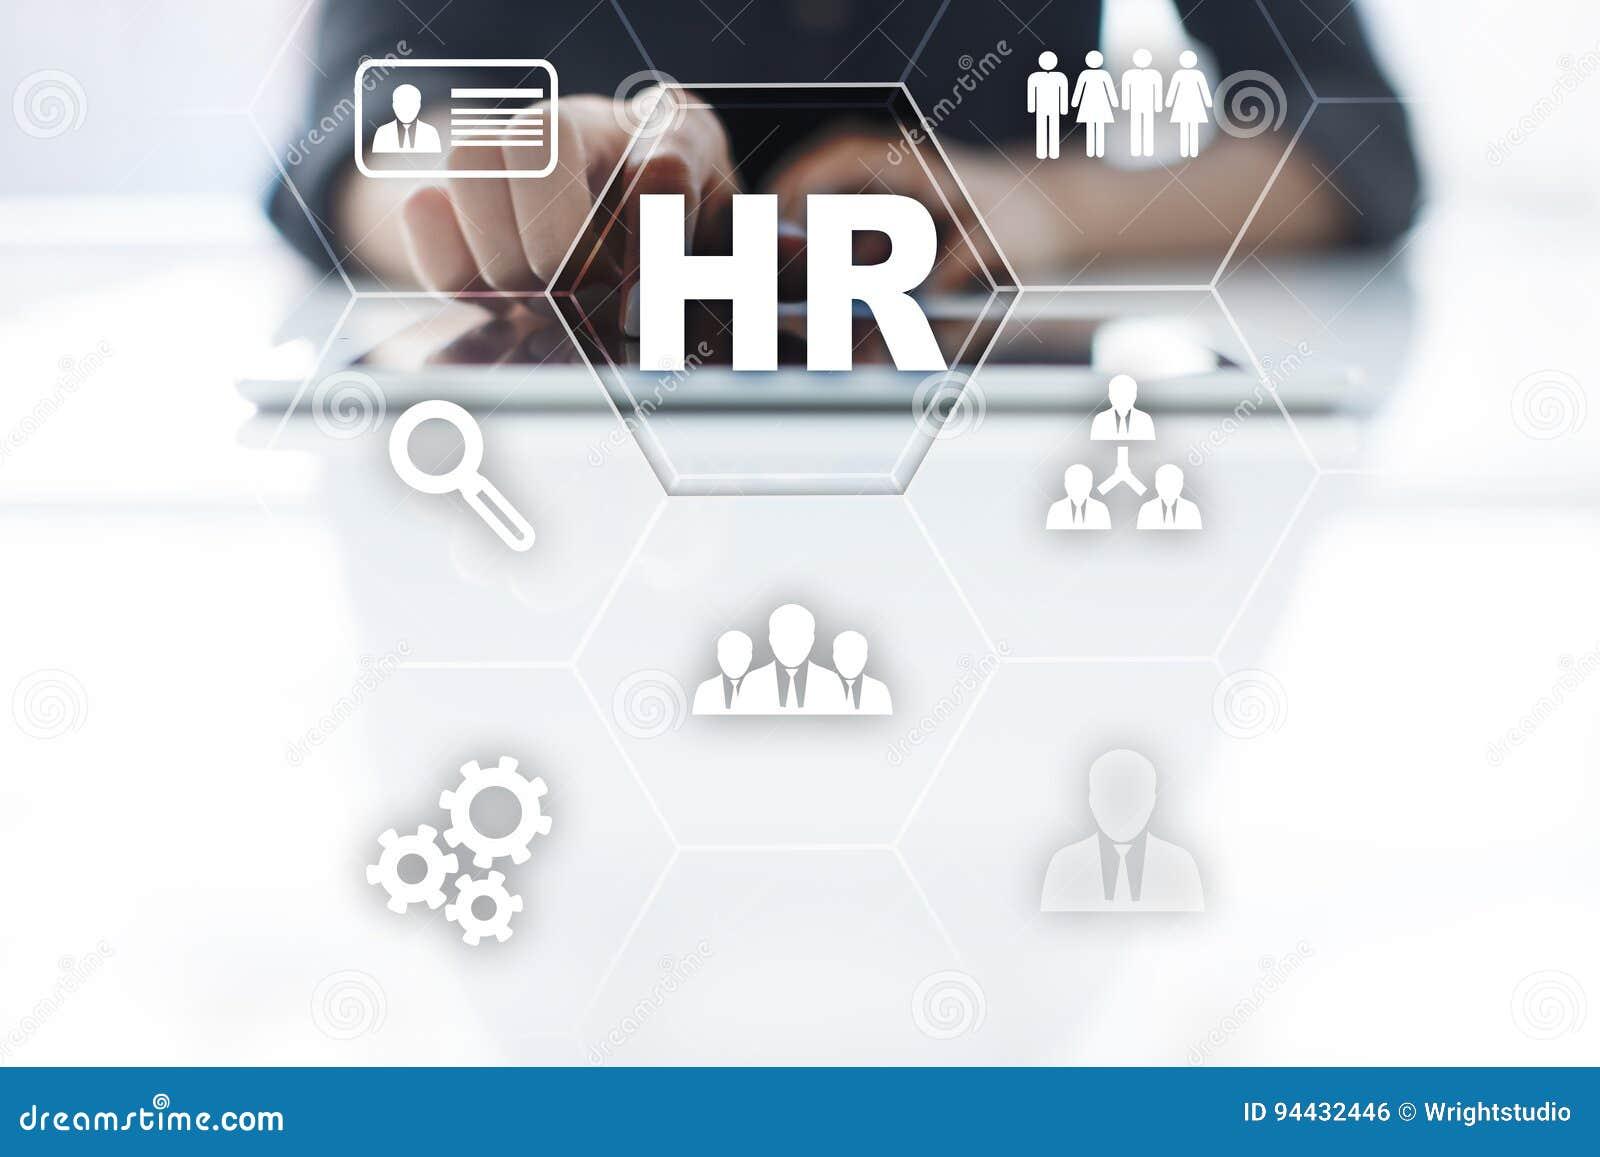 Gesto de recursos humanos hora recrutamento liderana e download comp ccuart Image collections